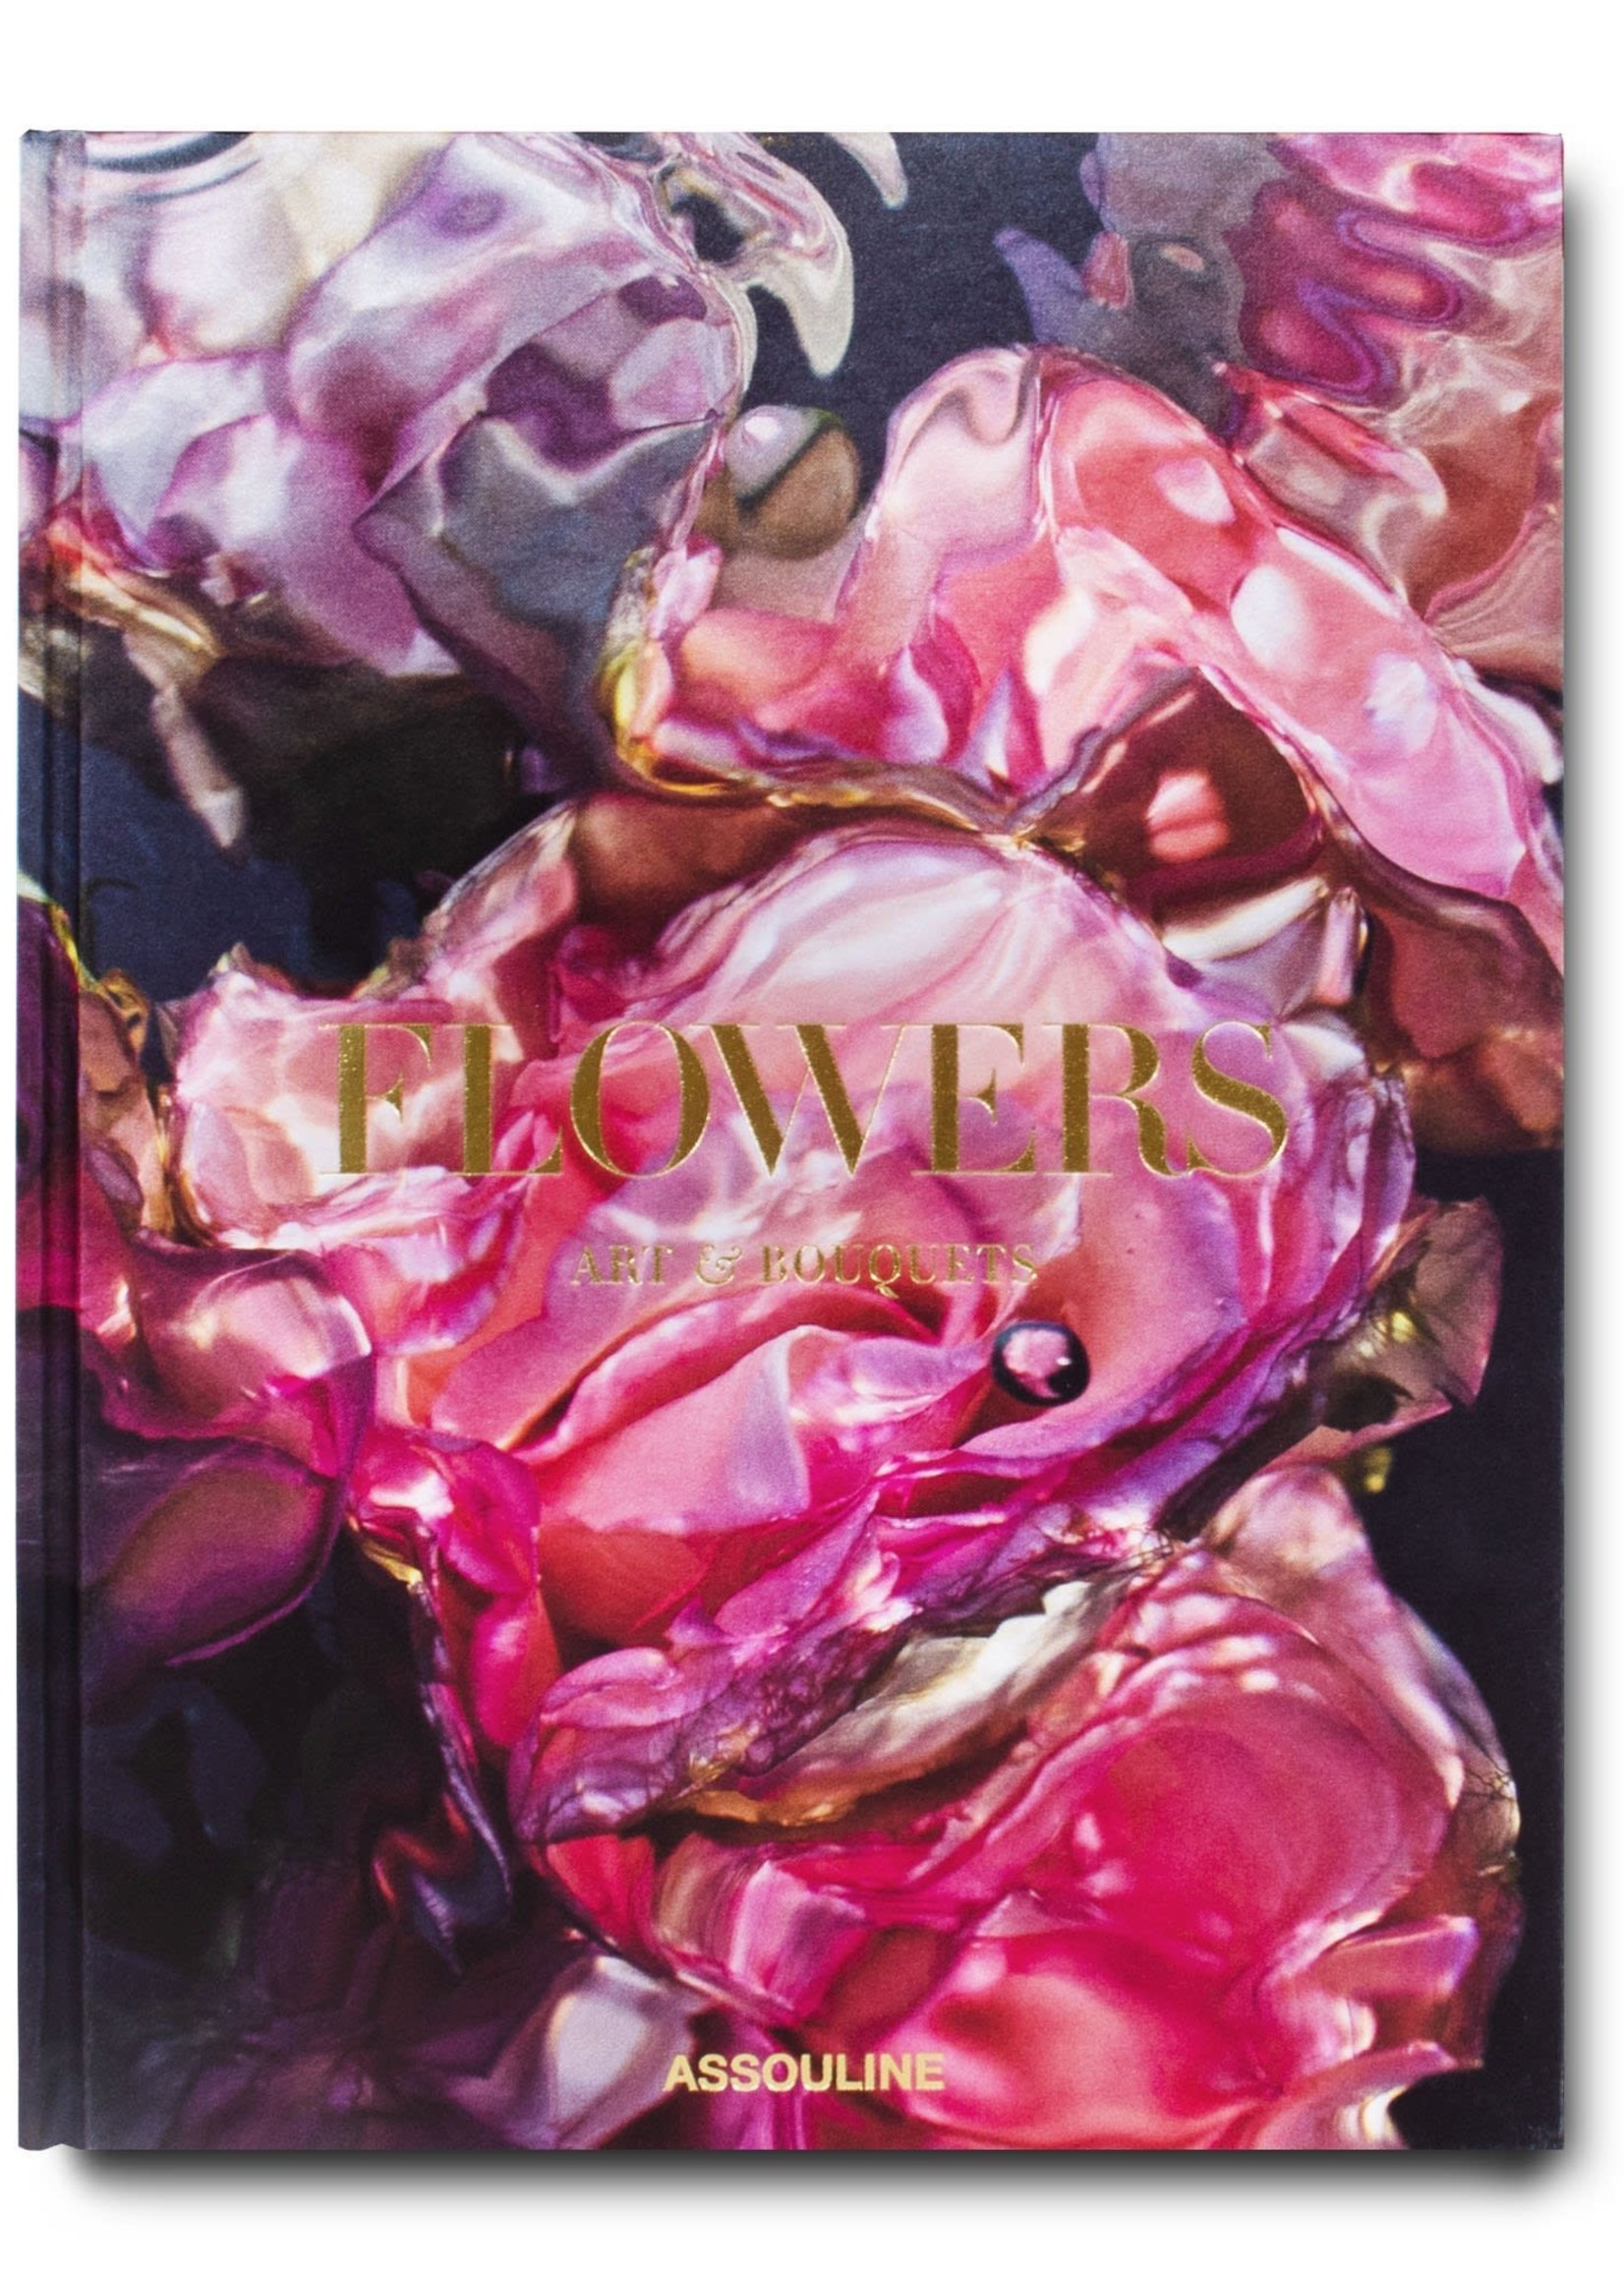 Assouline Assouline Flowers Art & Bouquets